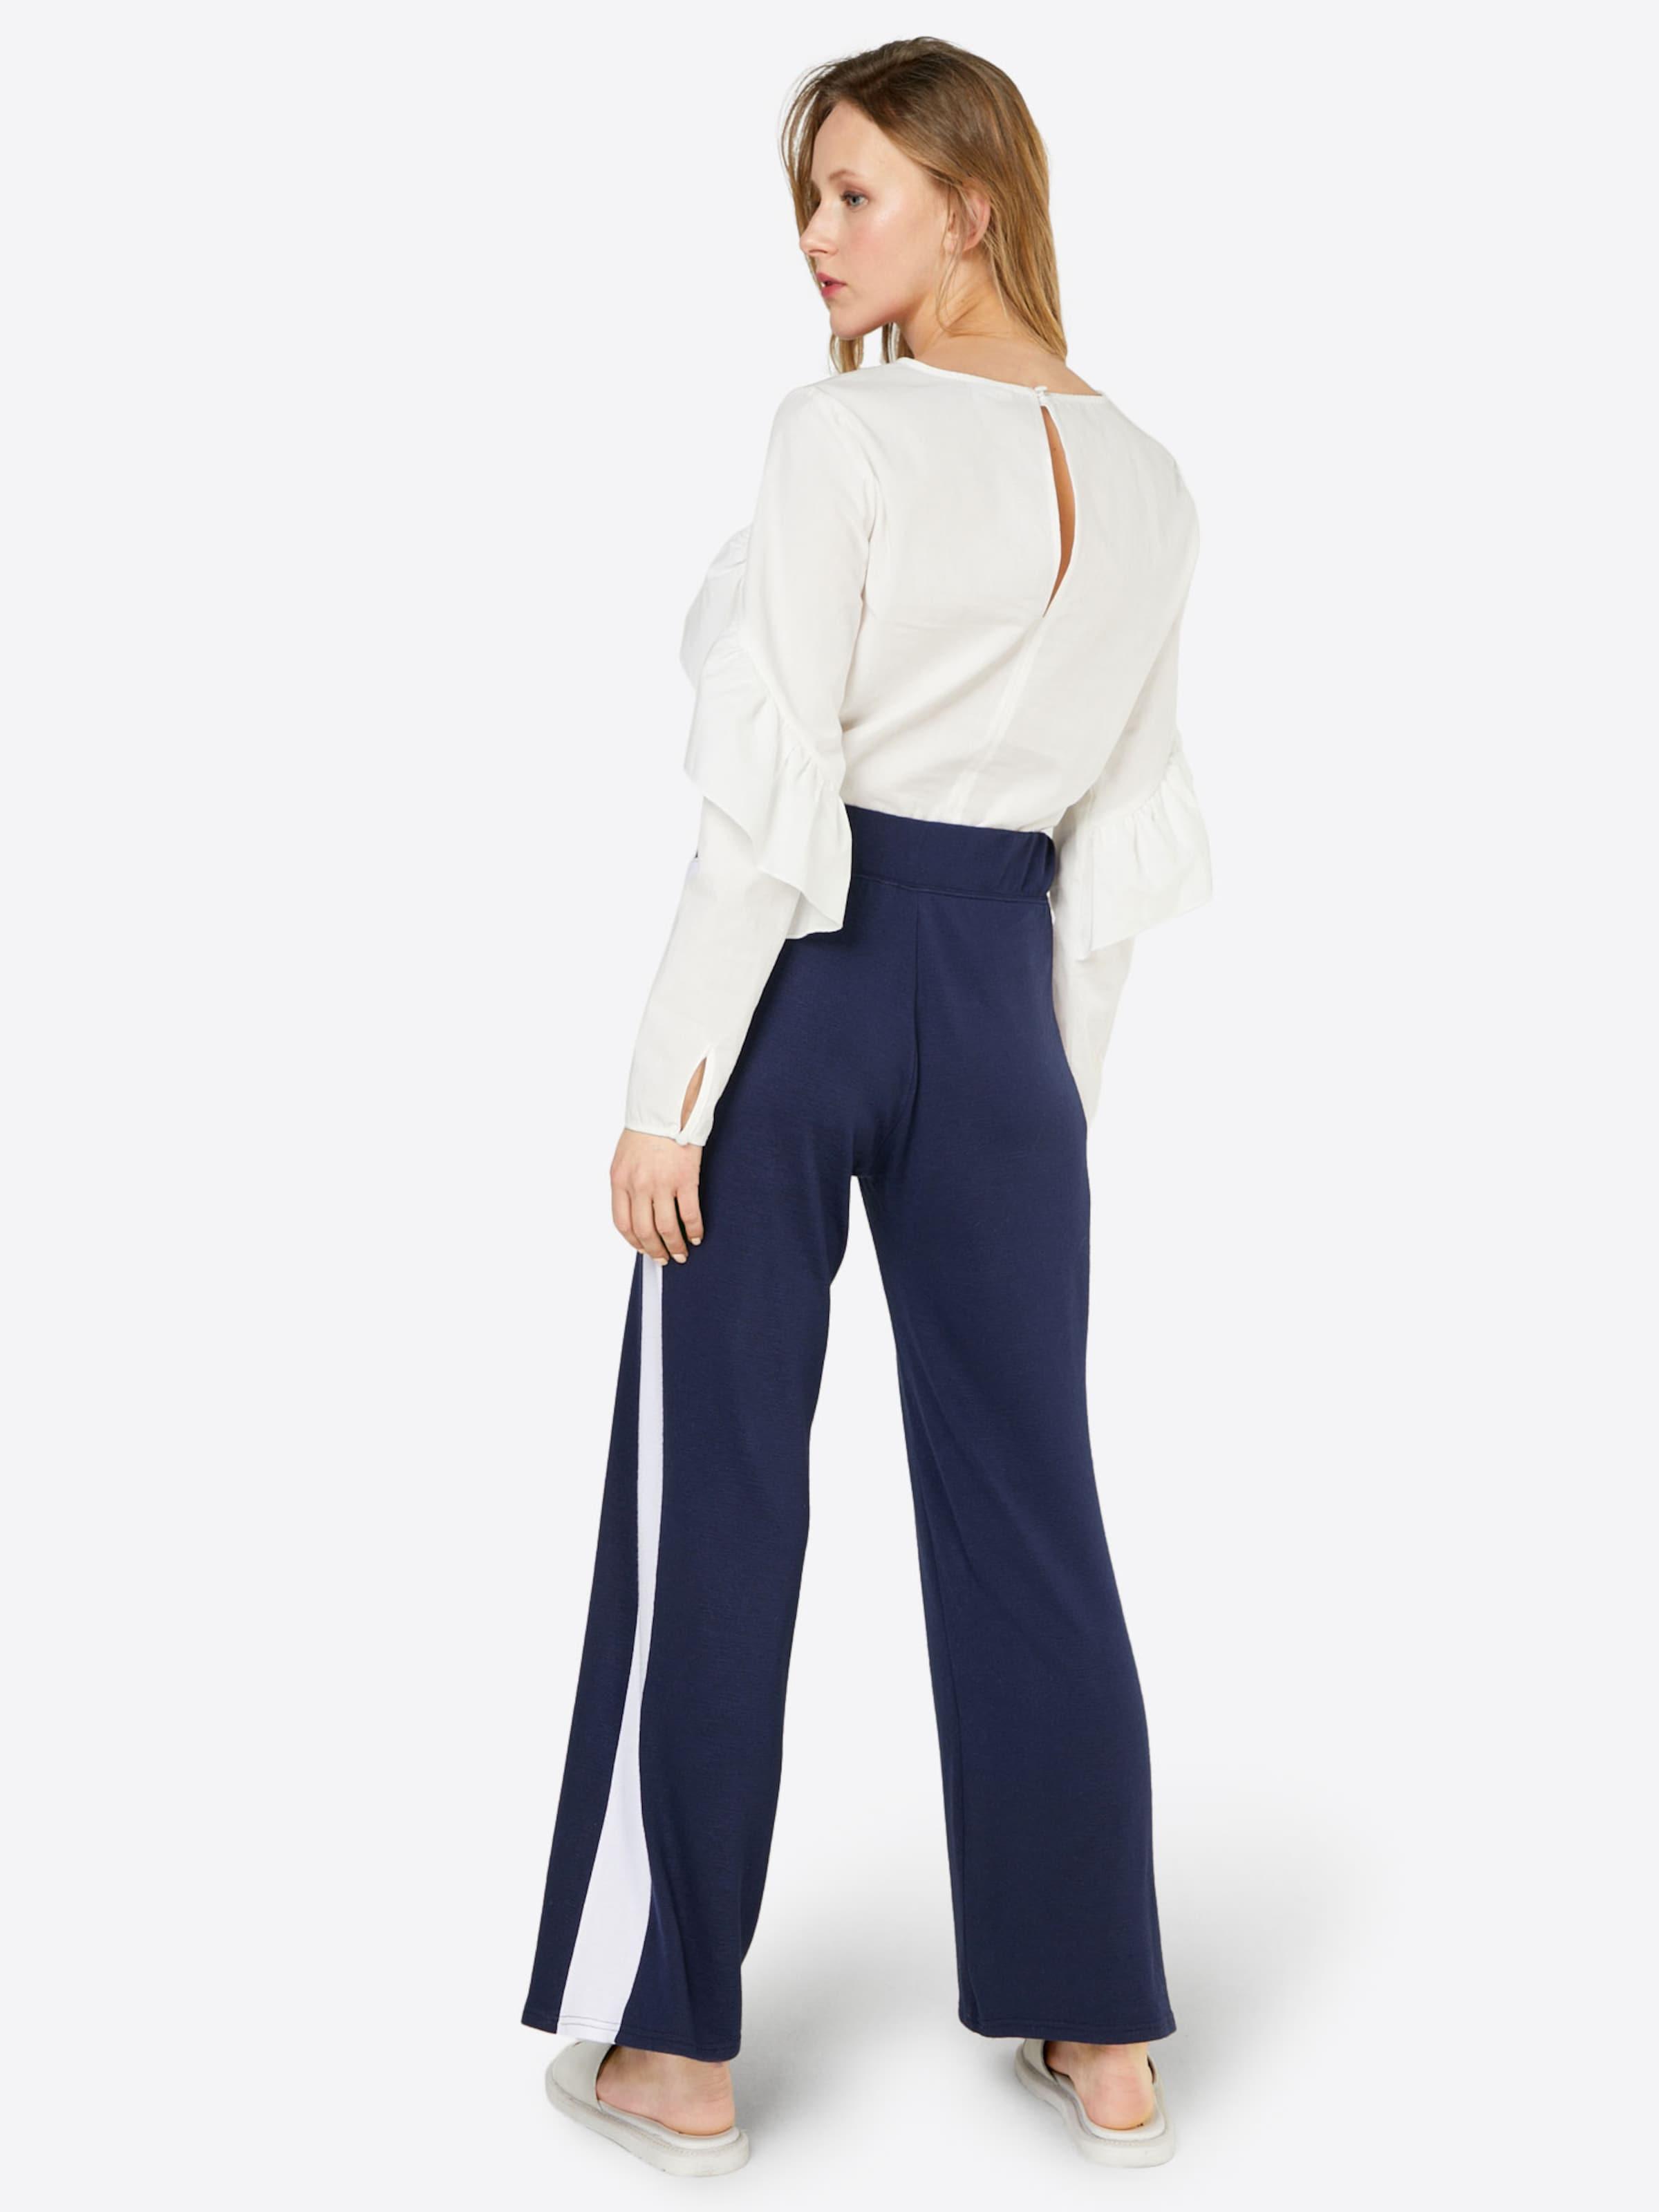 Bleu Gap Marine En Gap En Bleu En Gap Pantalon Marine Pantalon Pantalon gby76f